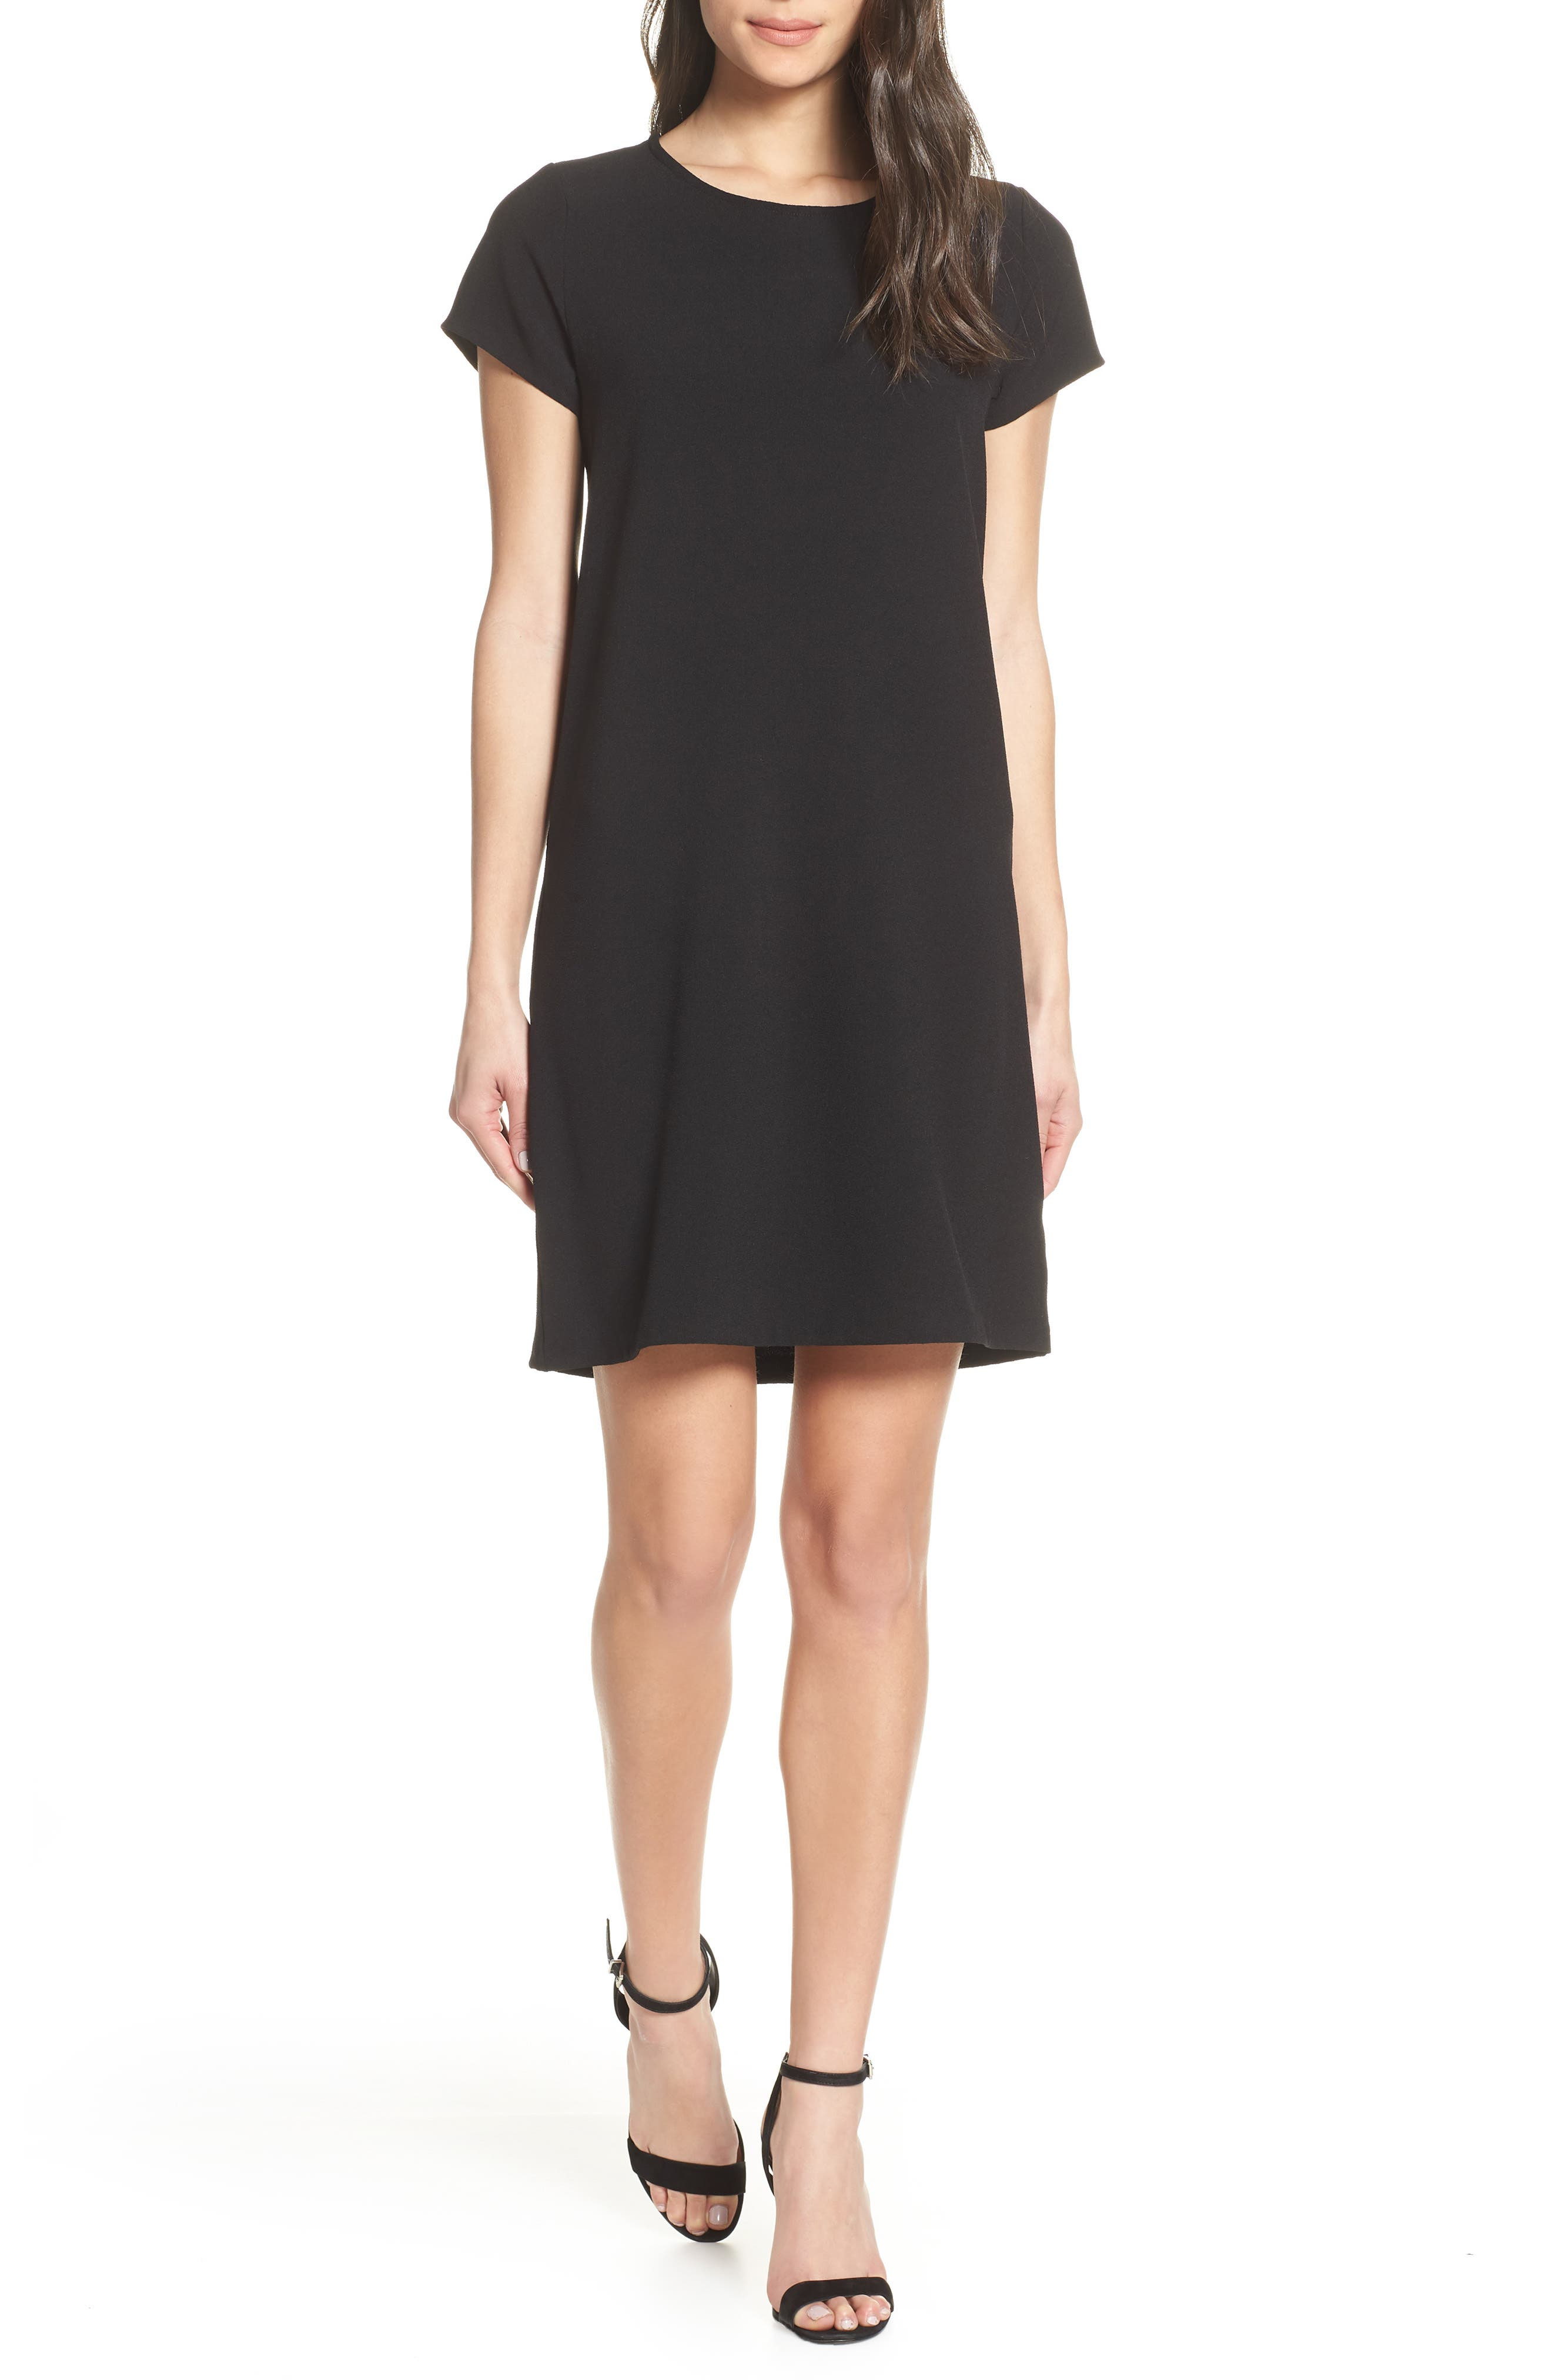 CHELSEA28 Crepe Shift Dress, Main, color, BLACK